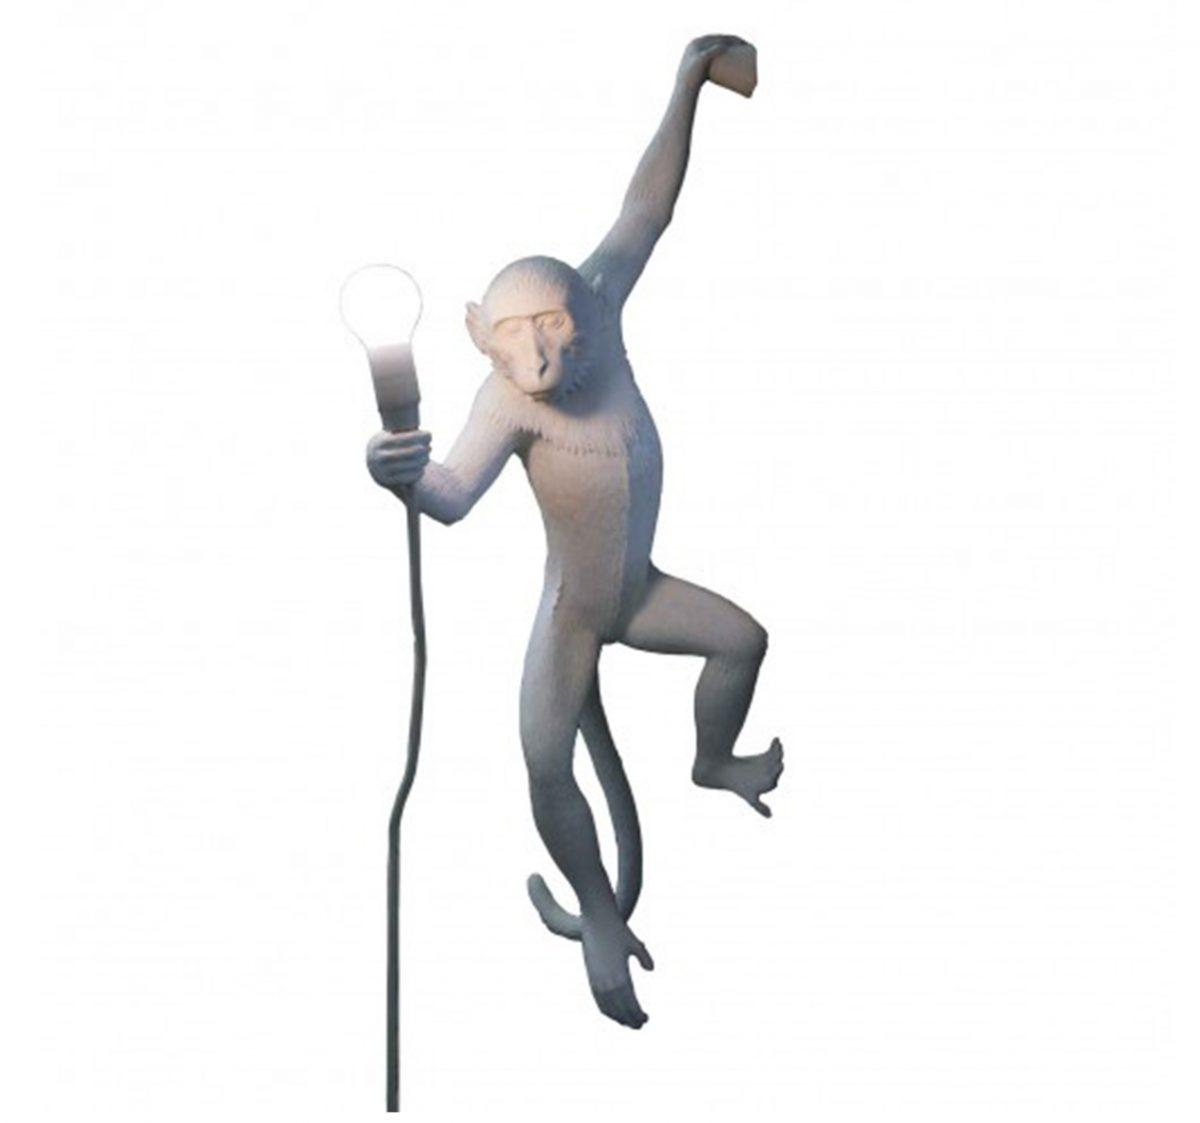 10. Hanging Monkey Lamp, M.R. Malerba for Seletti